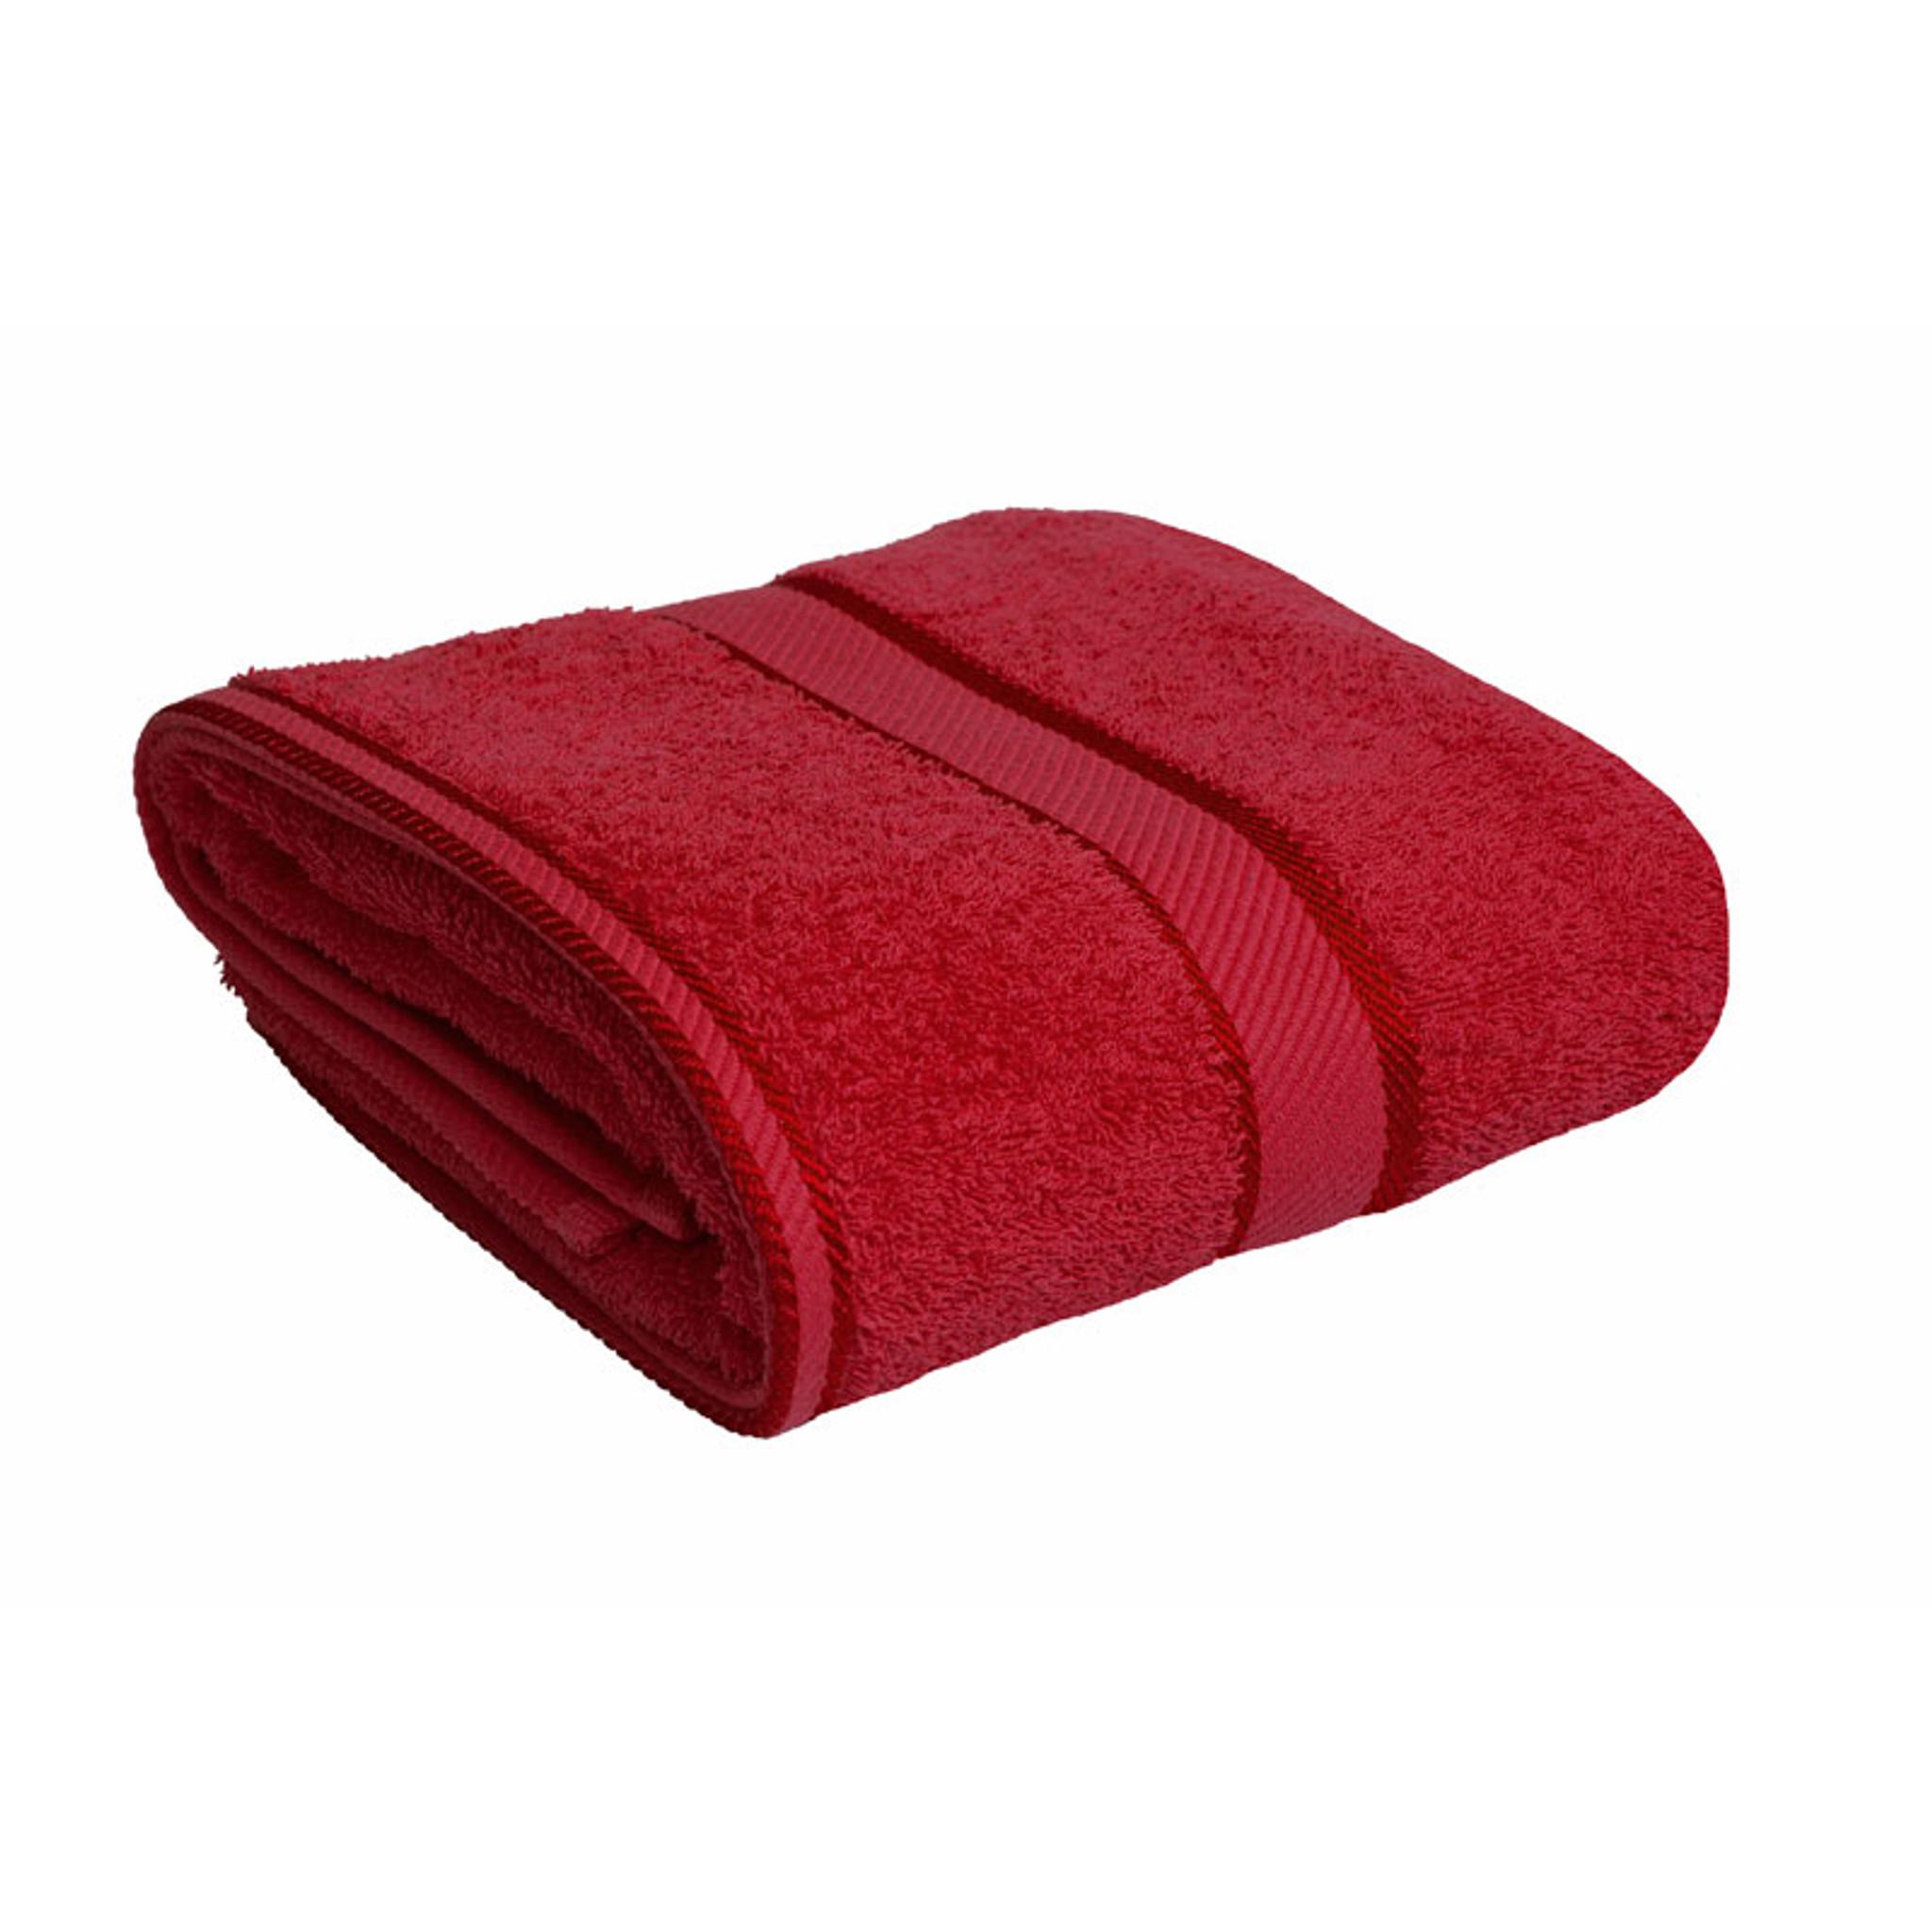 Red Towels Bathroom: 100% Cotton Red Bath Towel By Kingtex